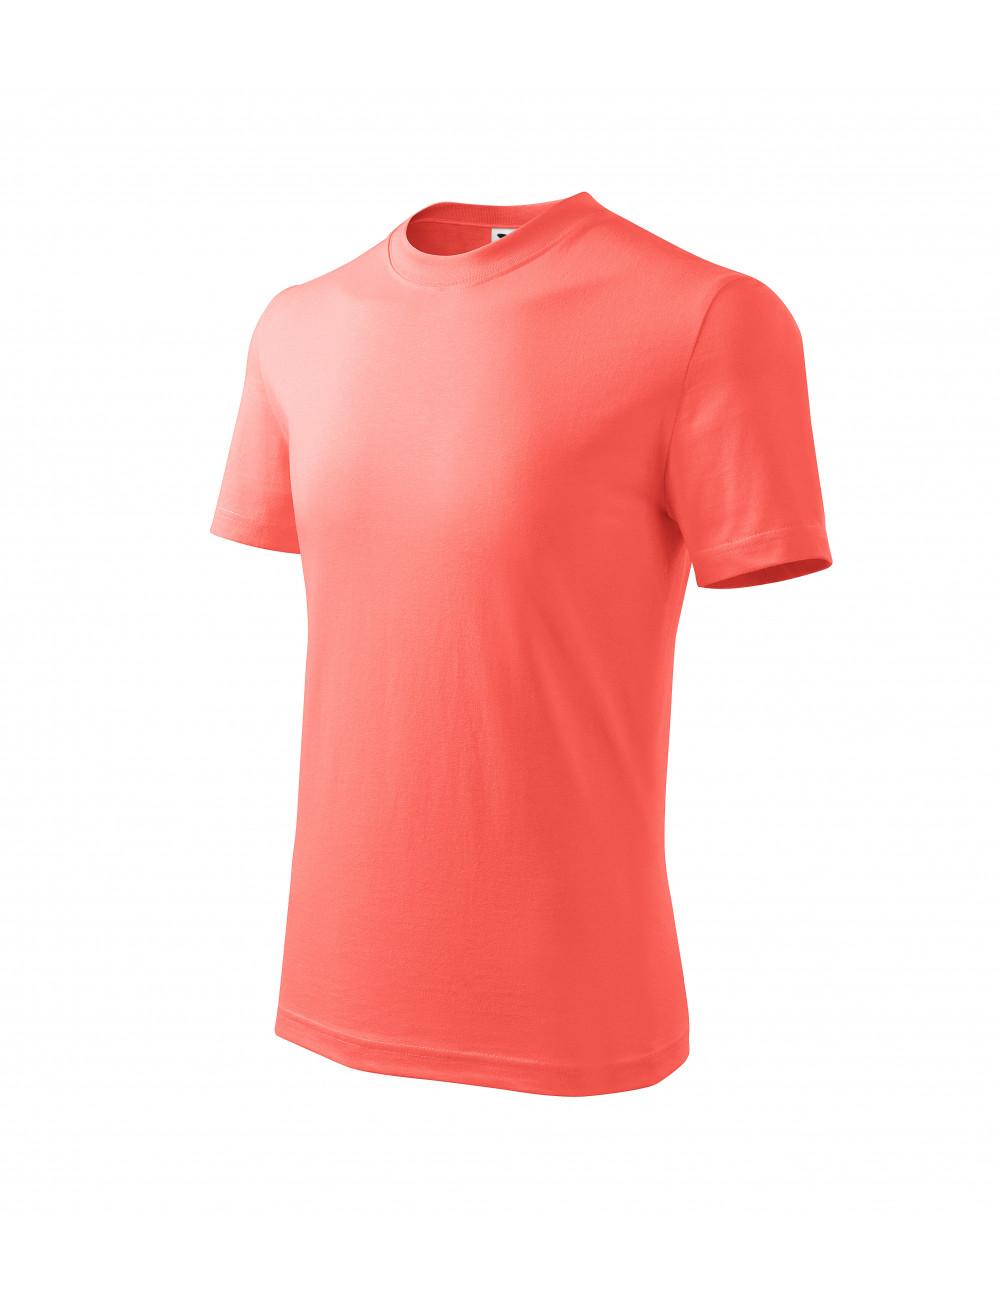 Adler MALFINI Koszulka dziecięca Basic 138 coral